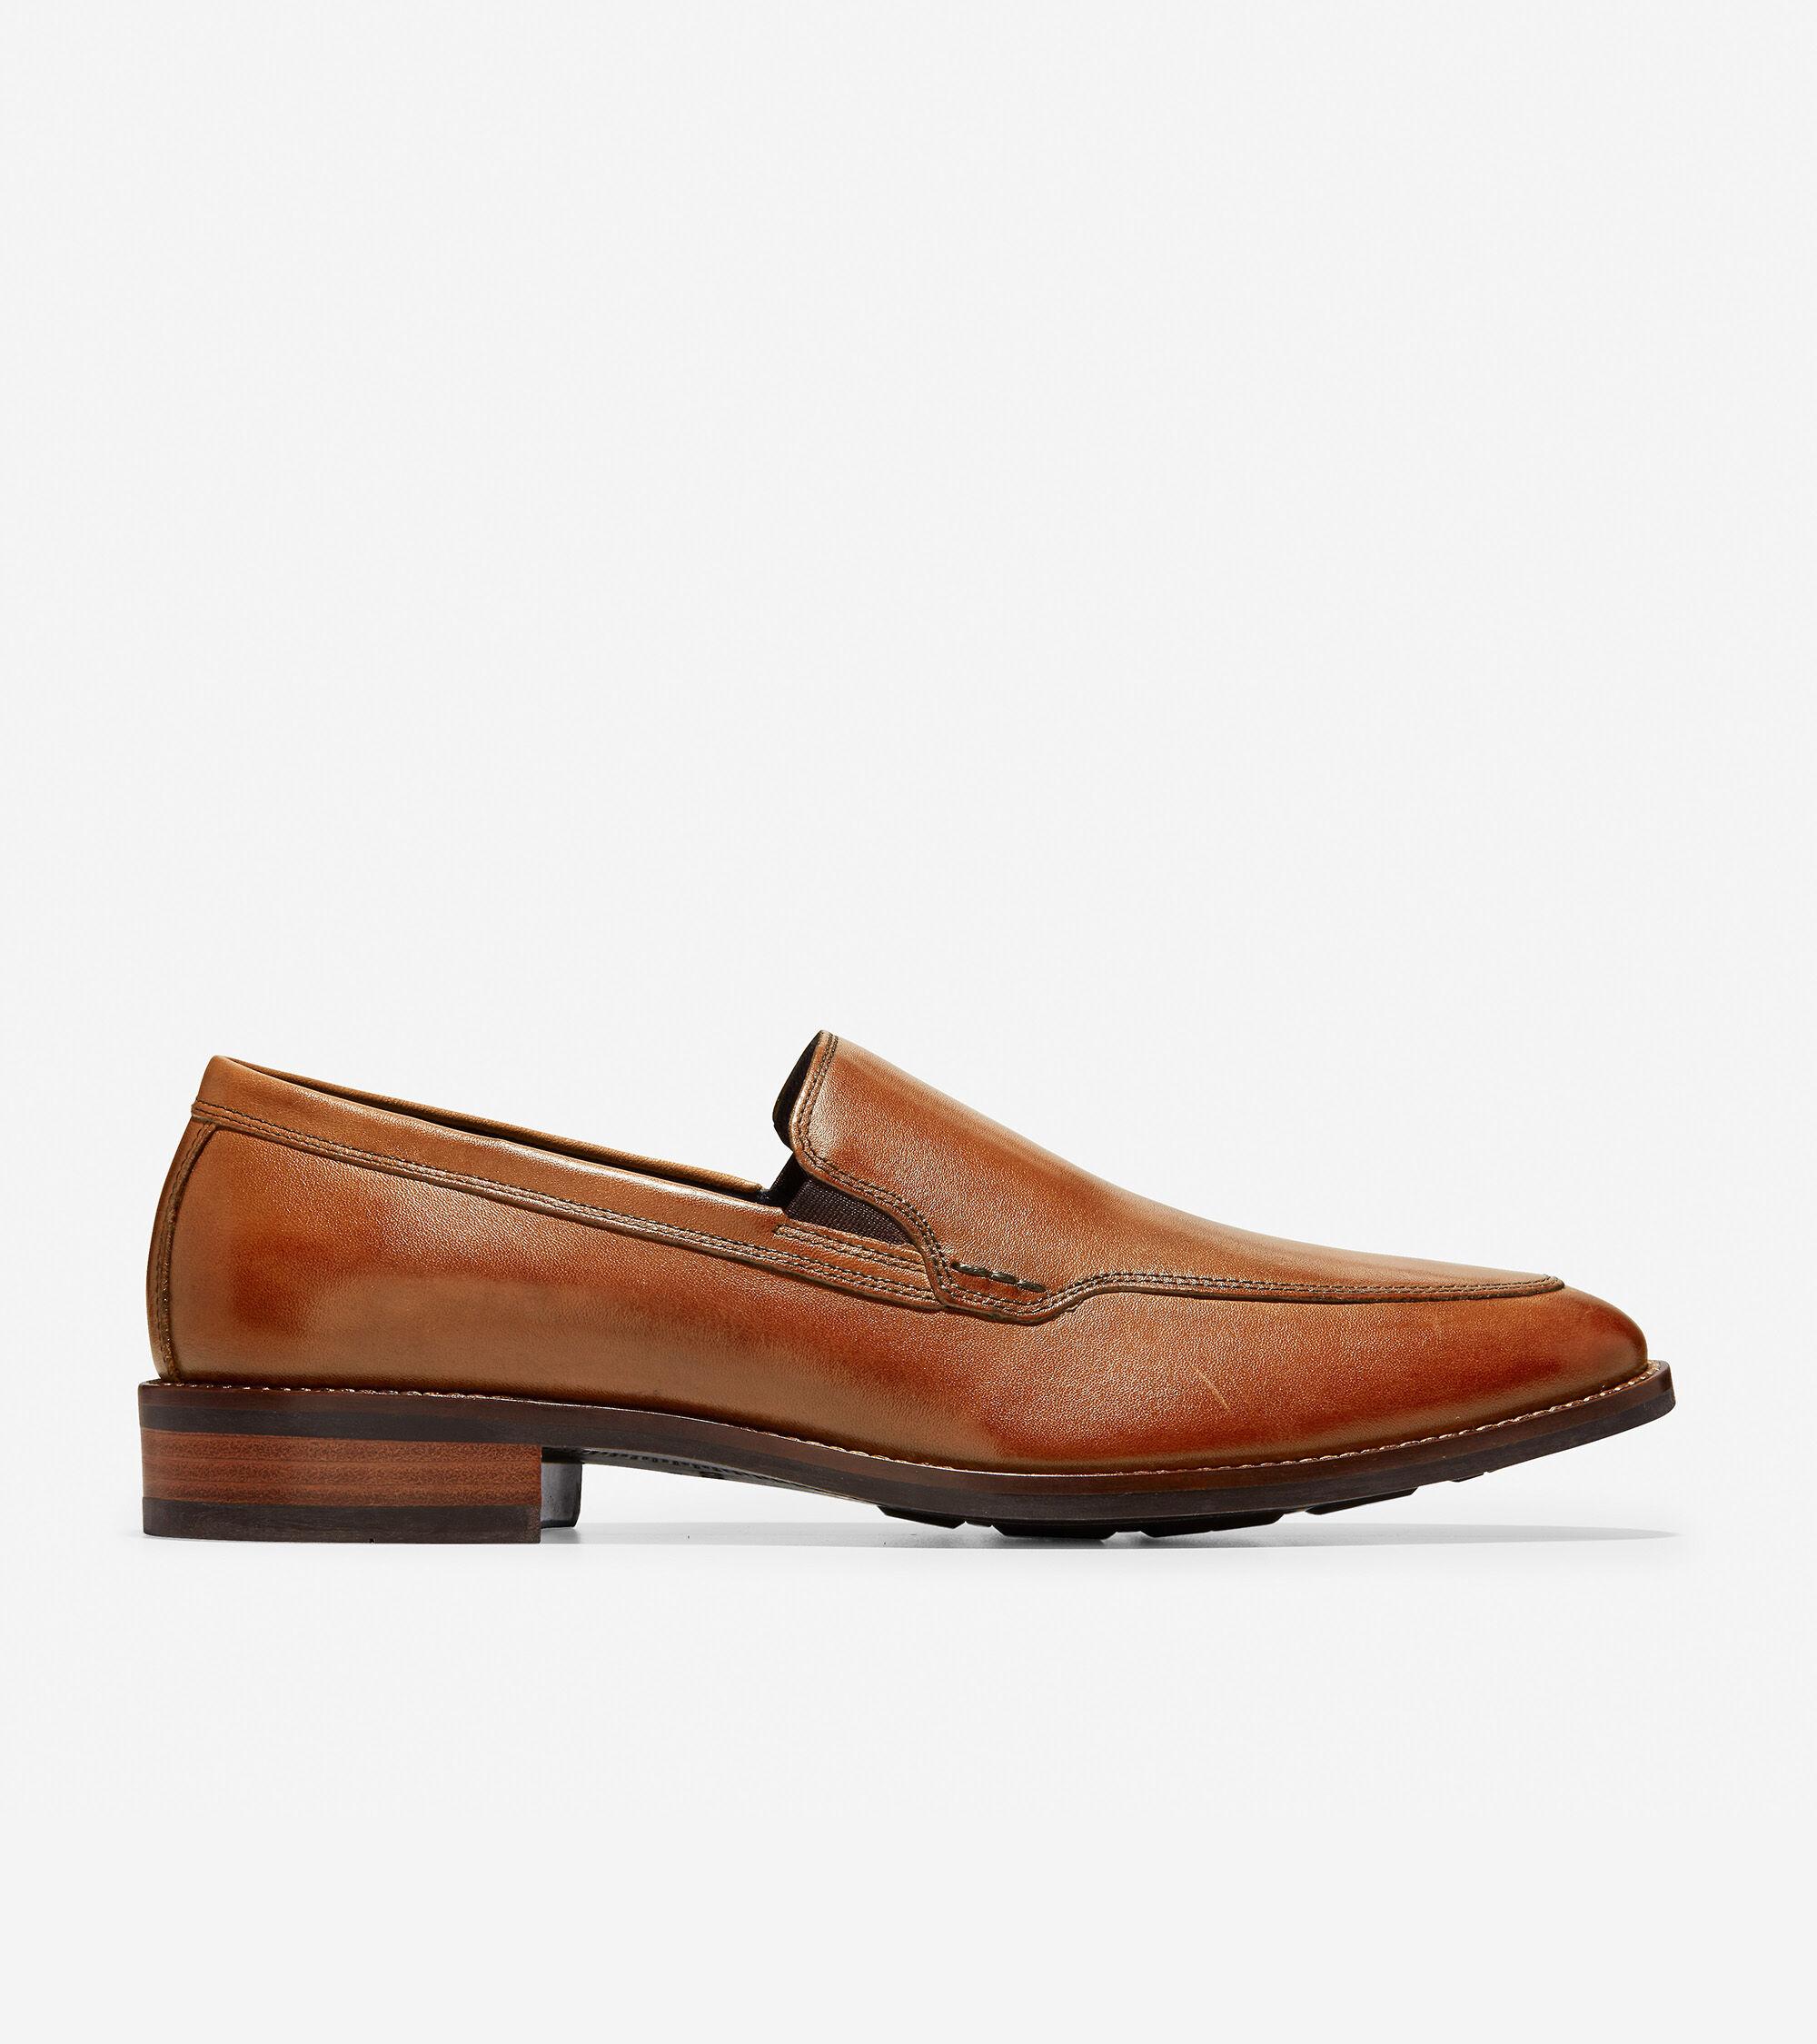 Cole Haan Lenox Hill Venetian Dress Shoes